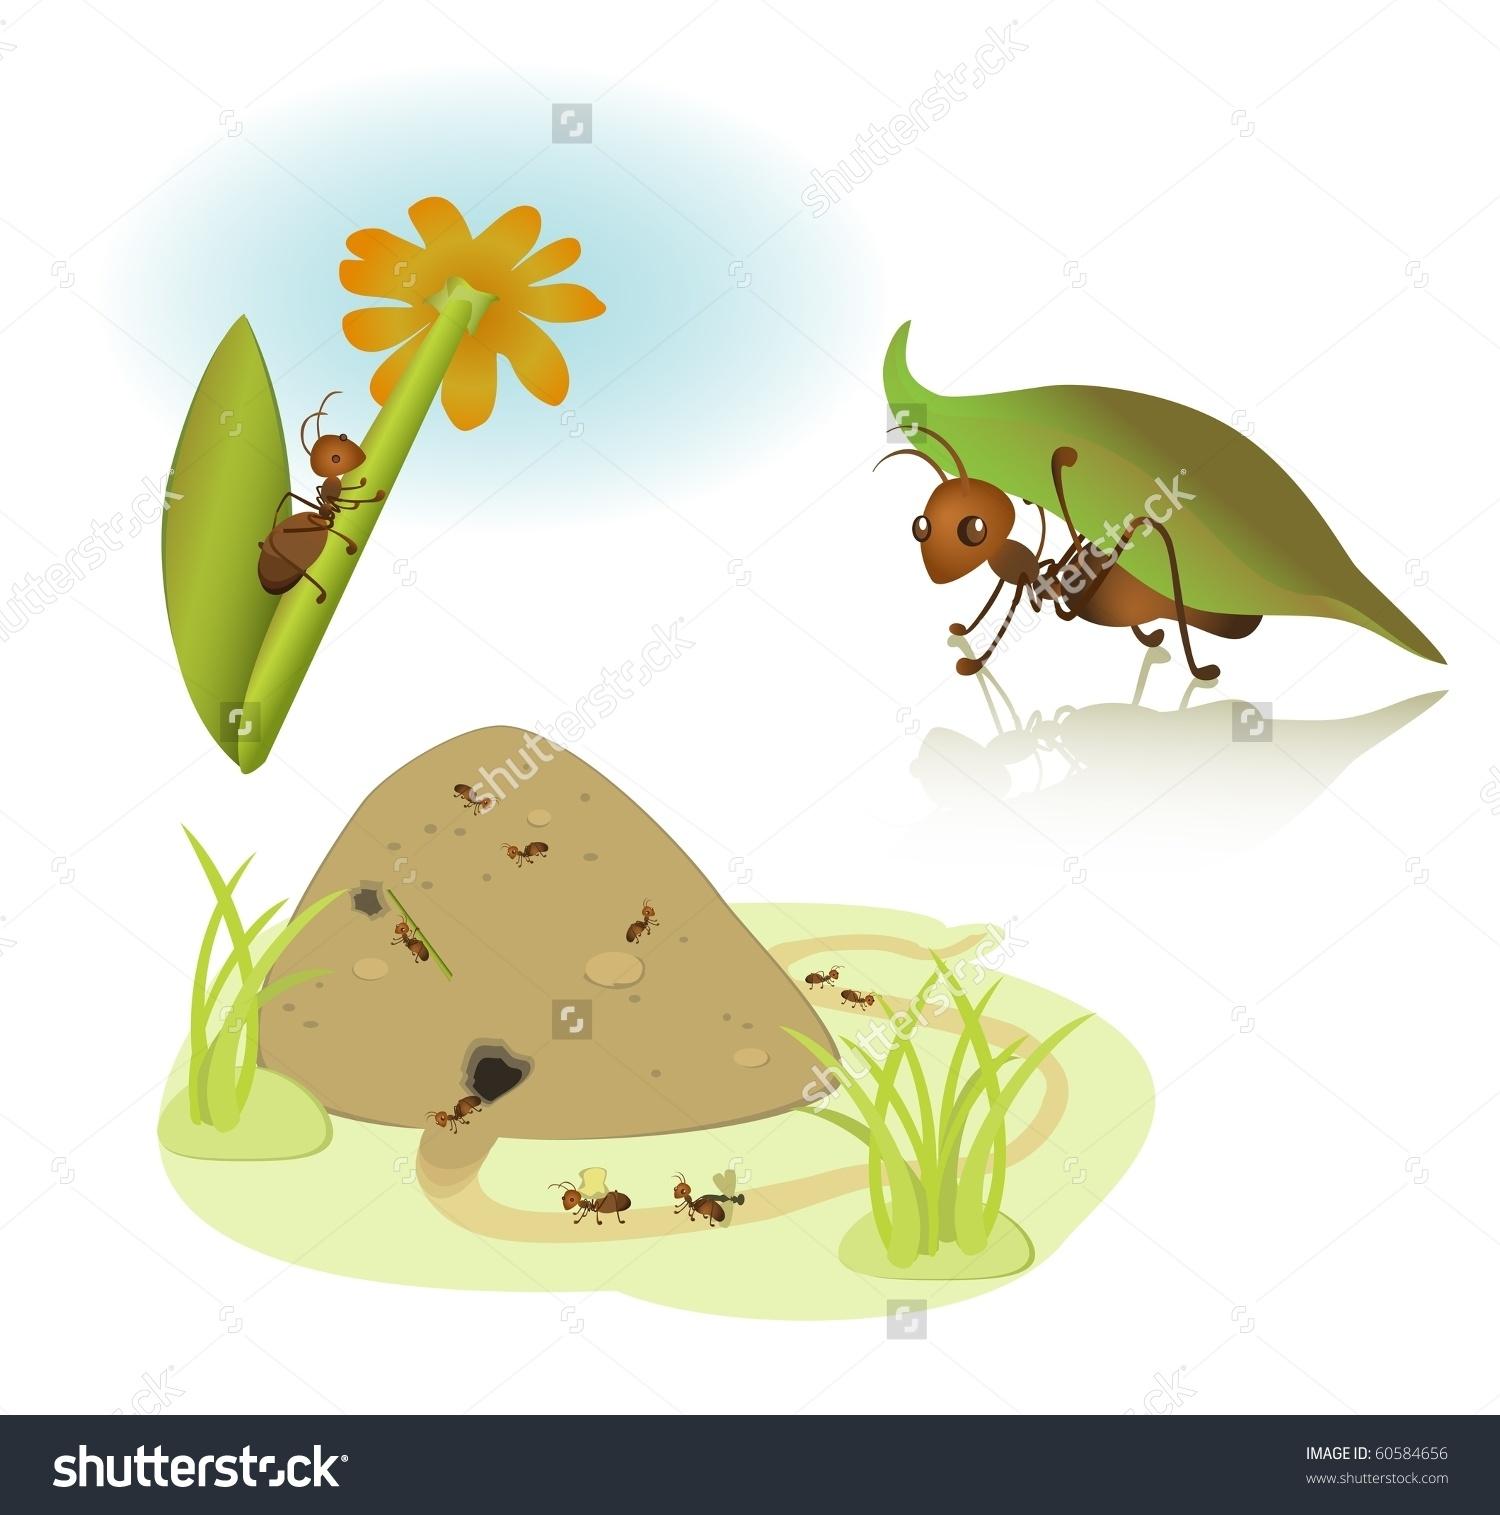 Ants Nest Clipart.